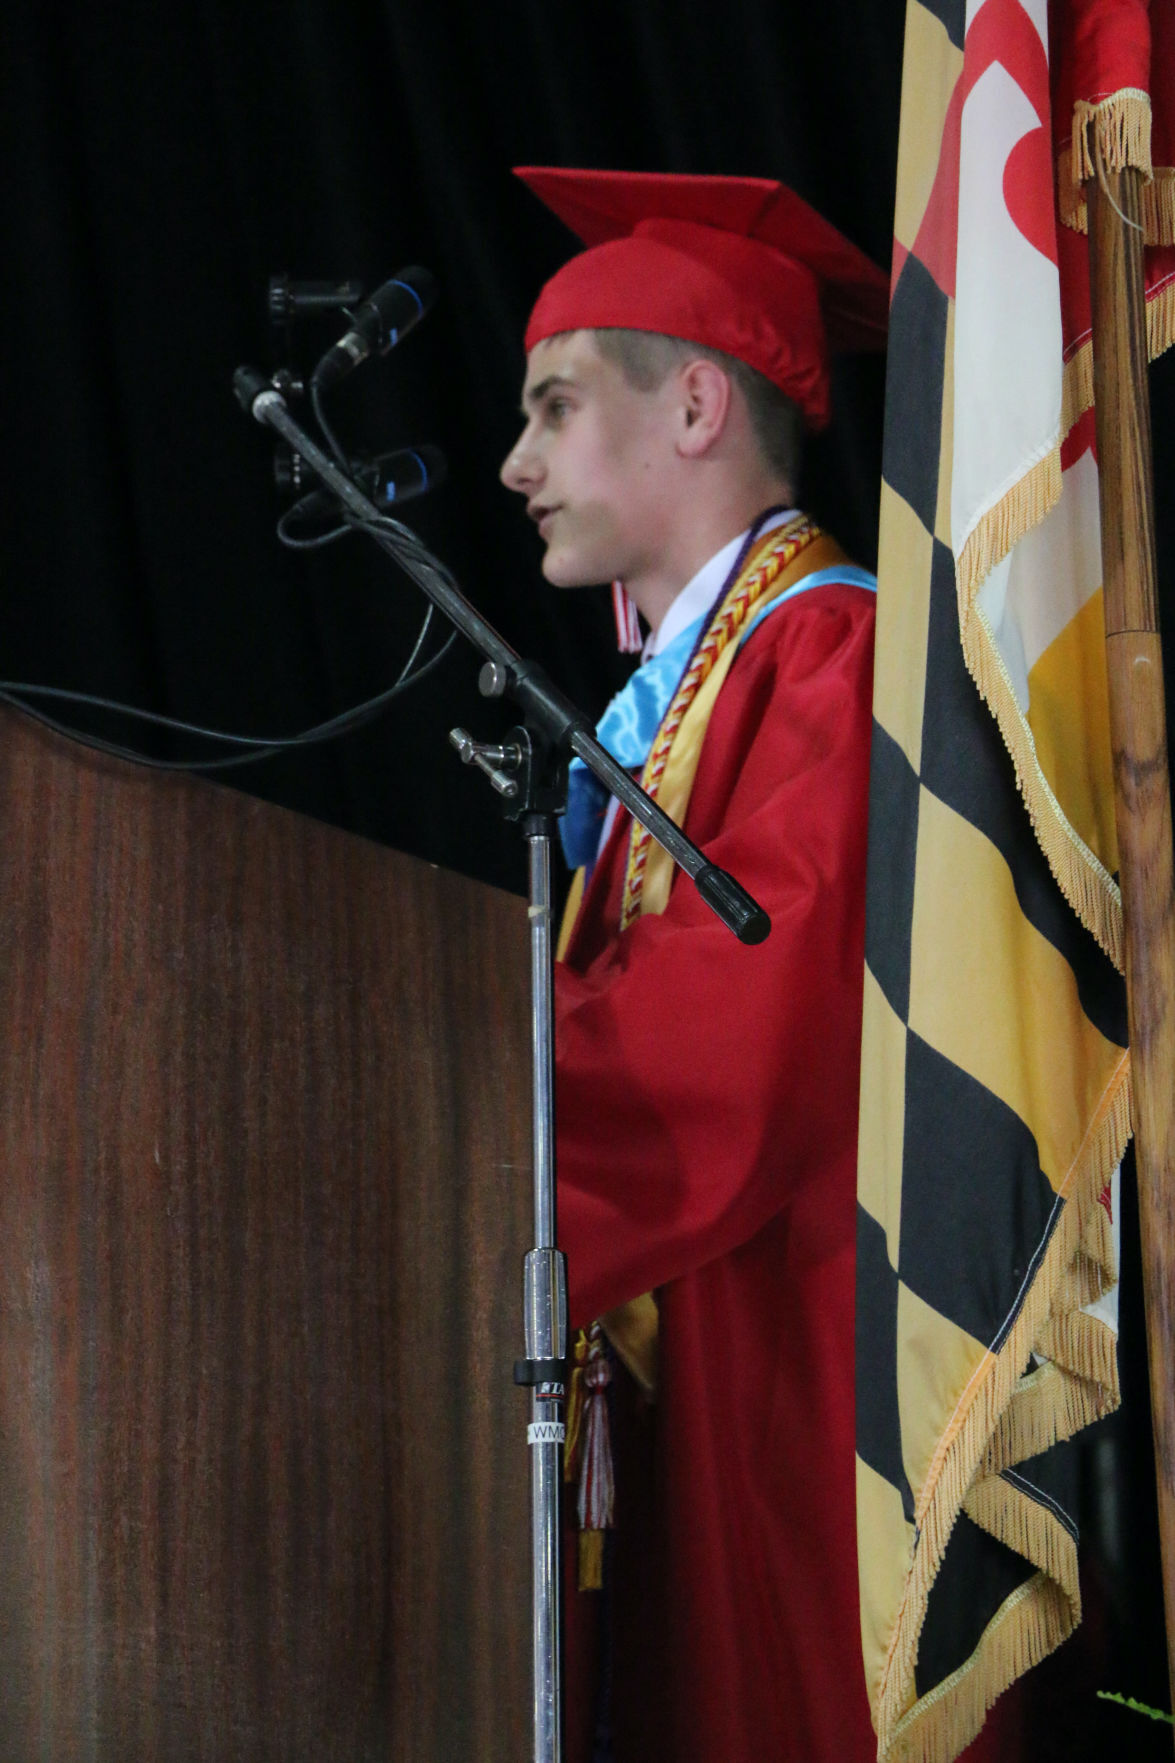 Southern valedictorian speaks